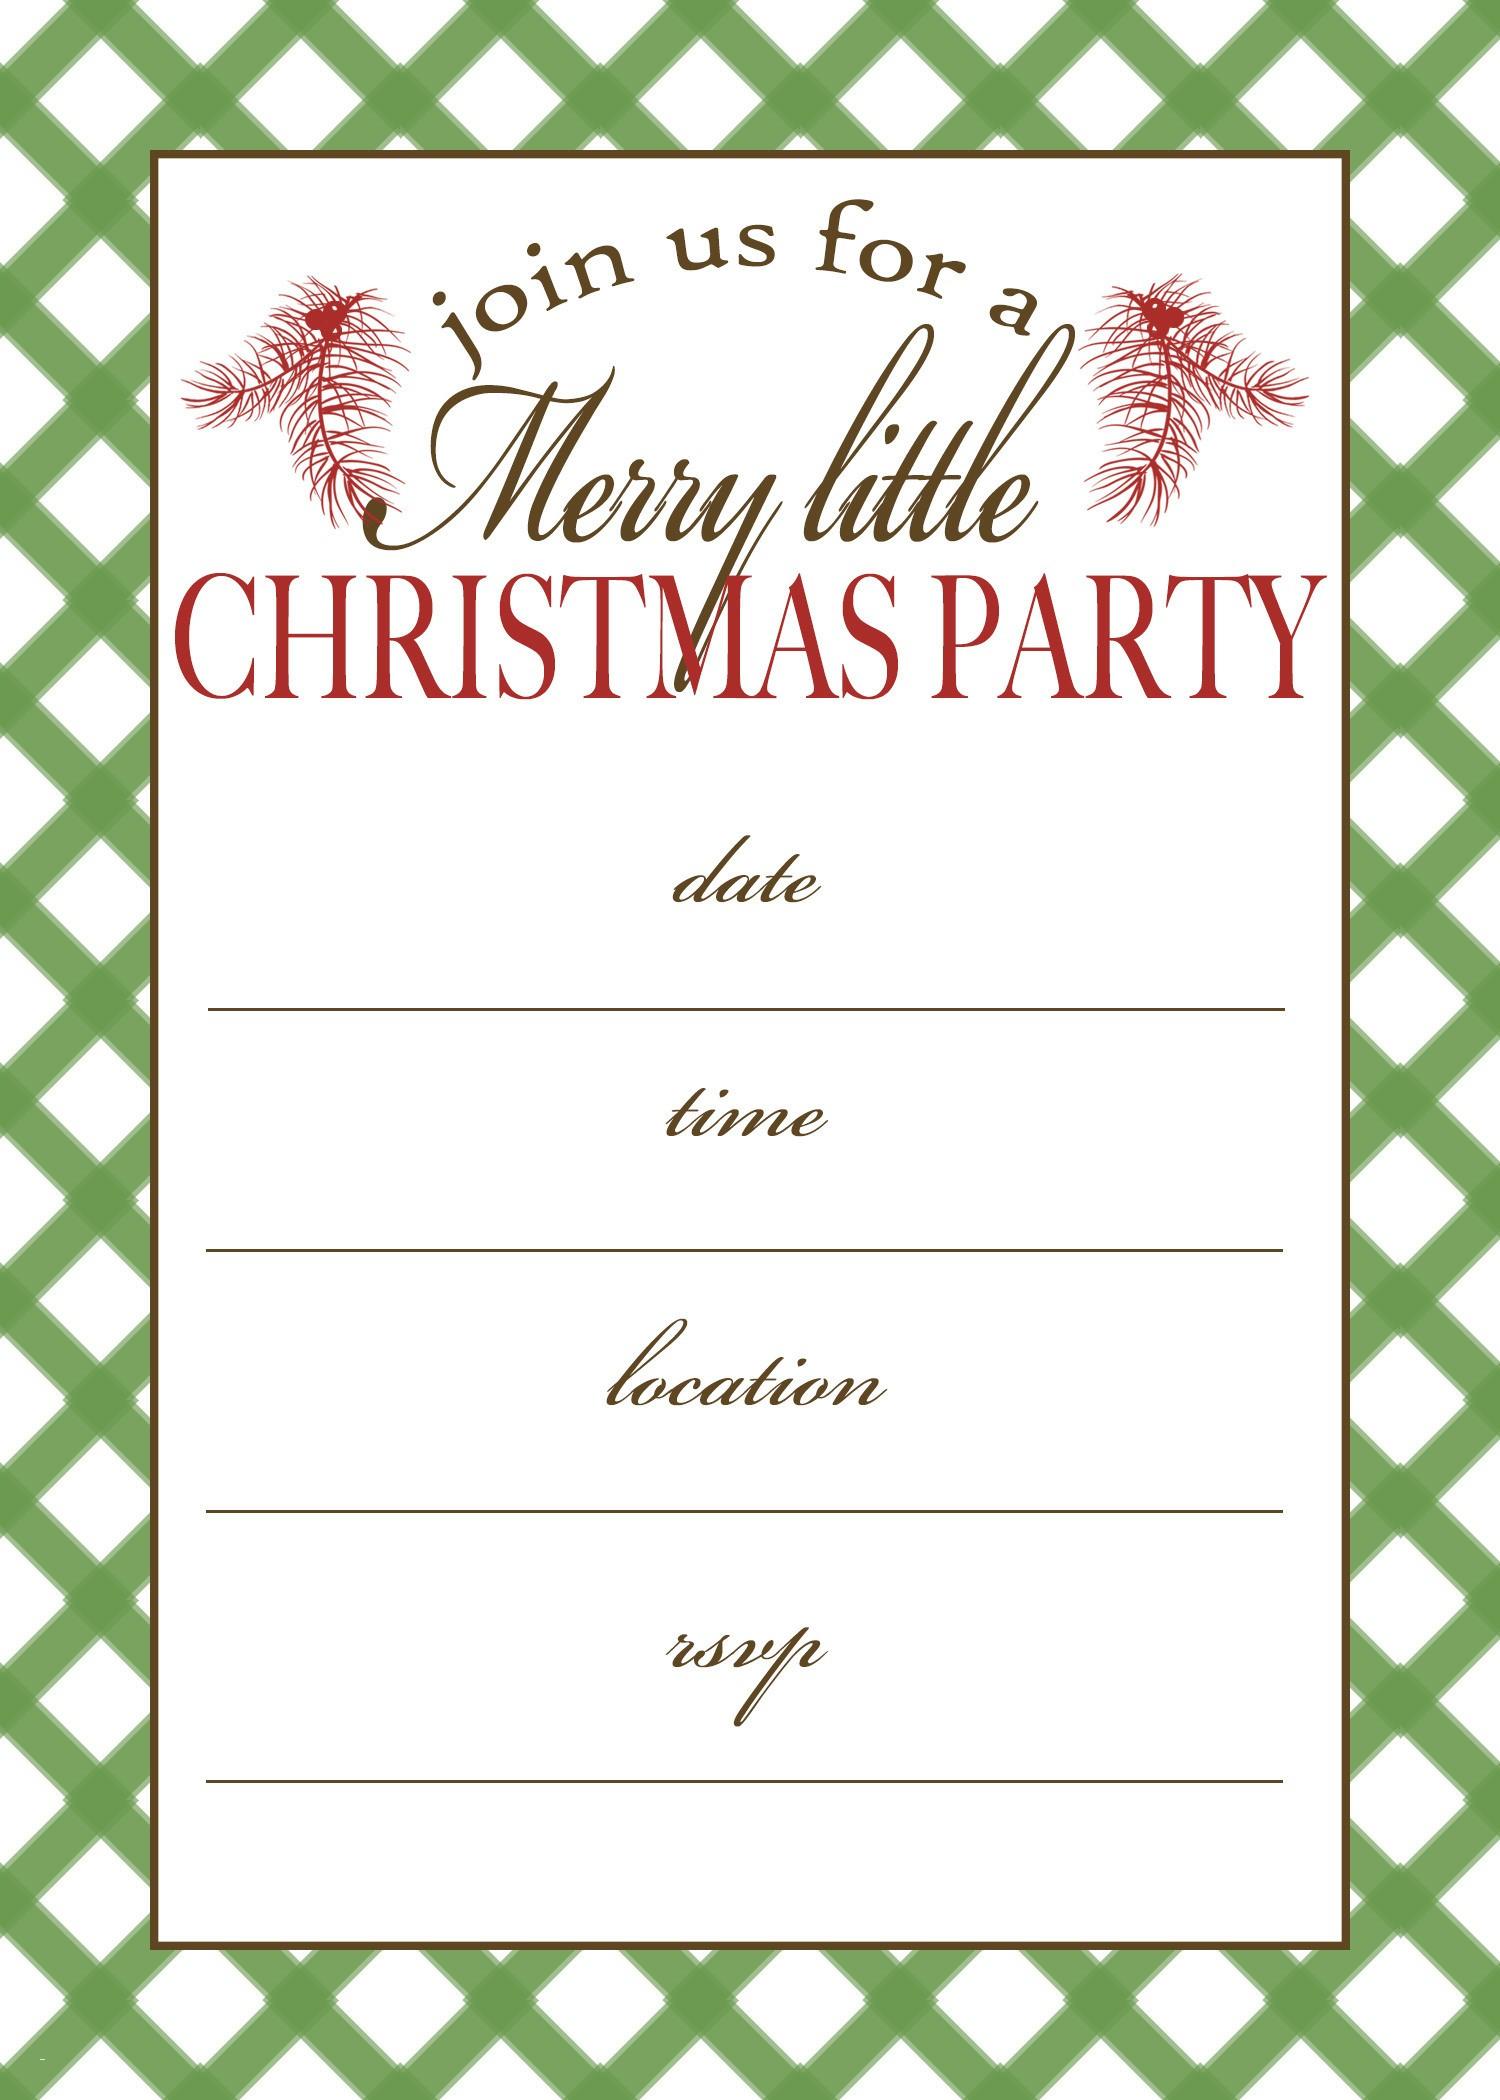 Free Printable Christmas Party Flyer Templates Invitation Valid - Free Printable Christmas Party Flyer Templates